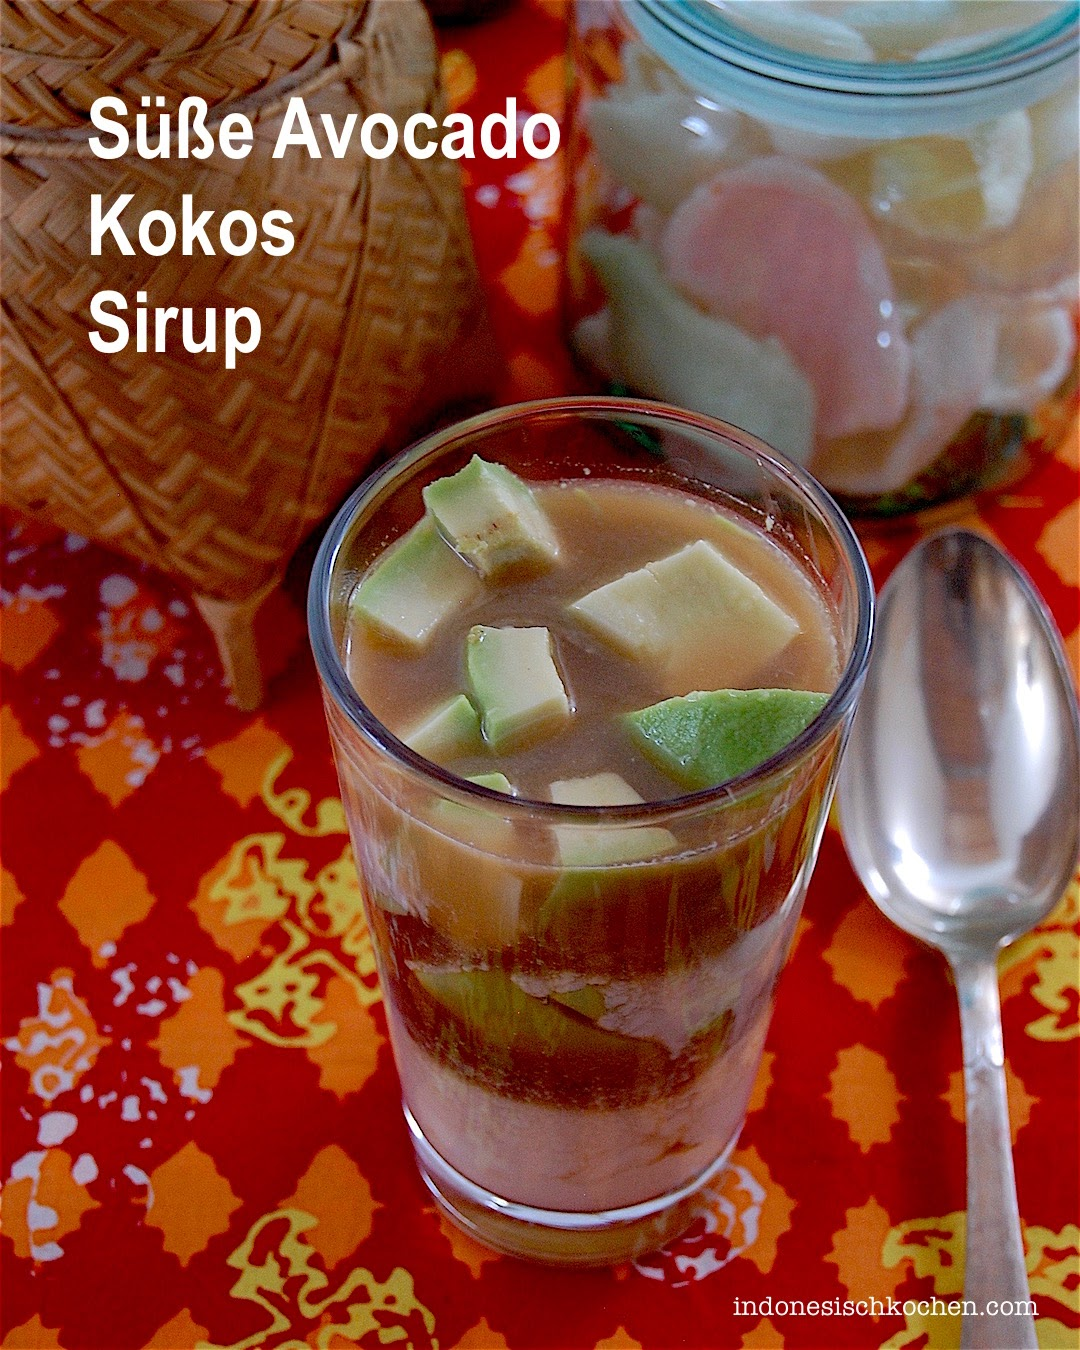 Süße Avocado Kokos Sirup Balinesisch kochen